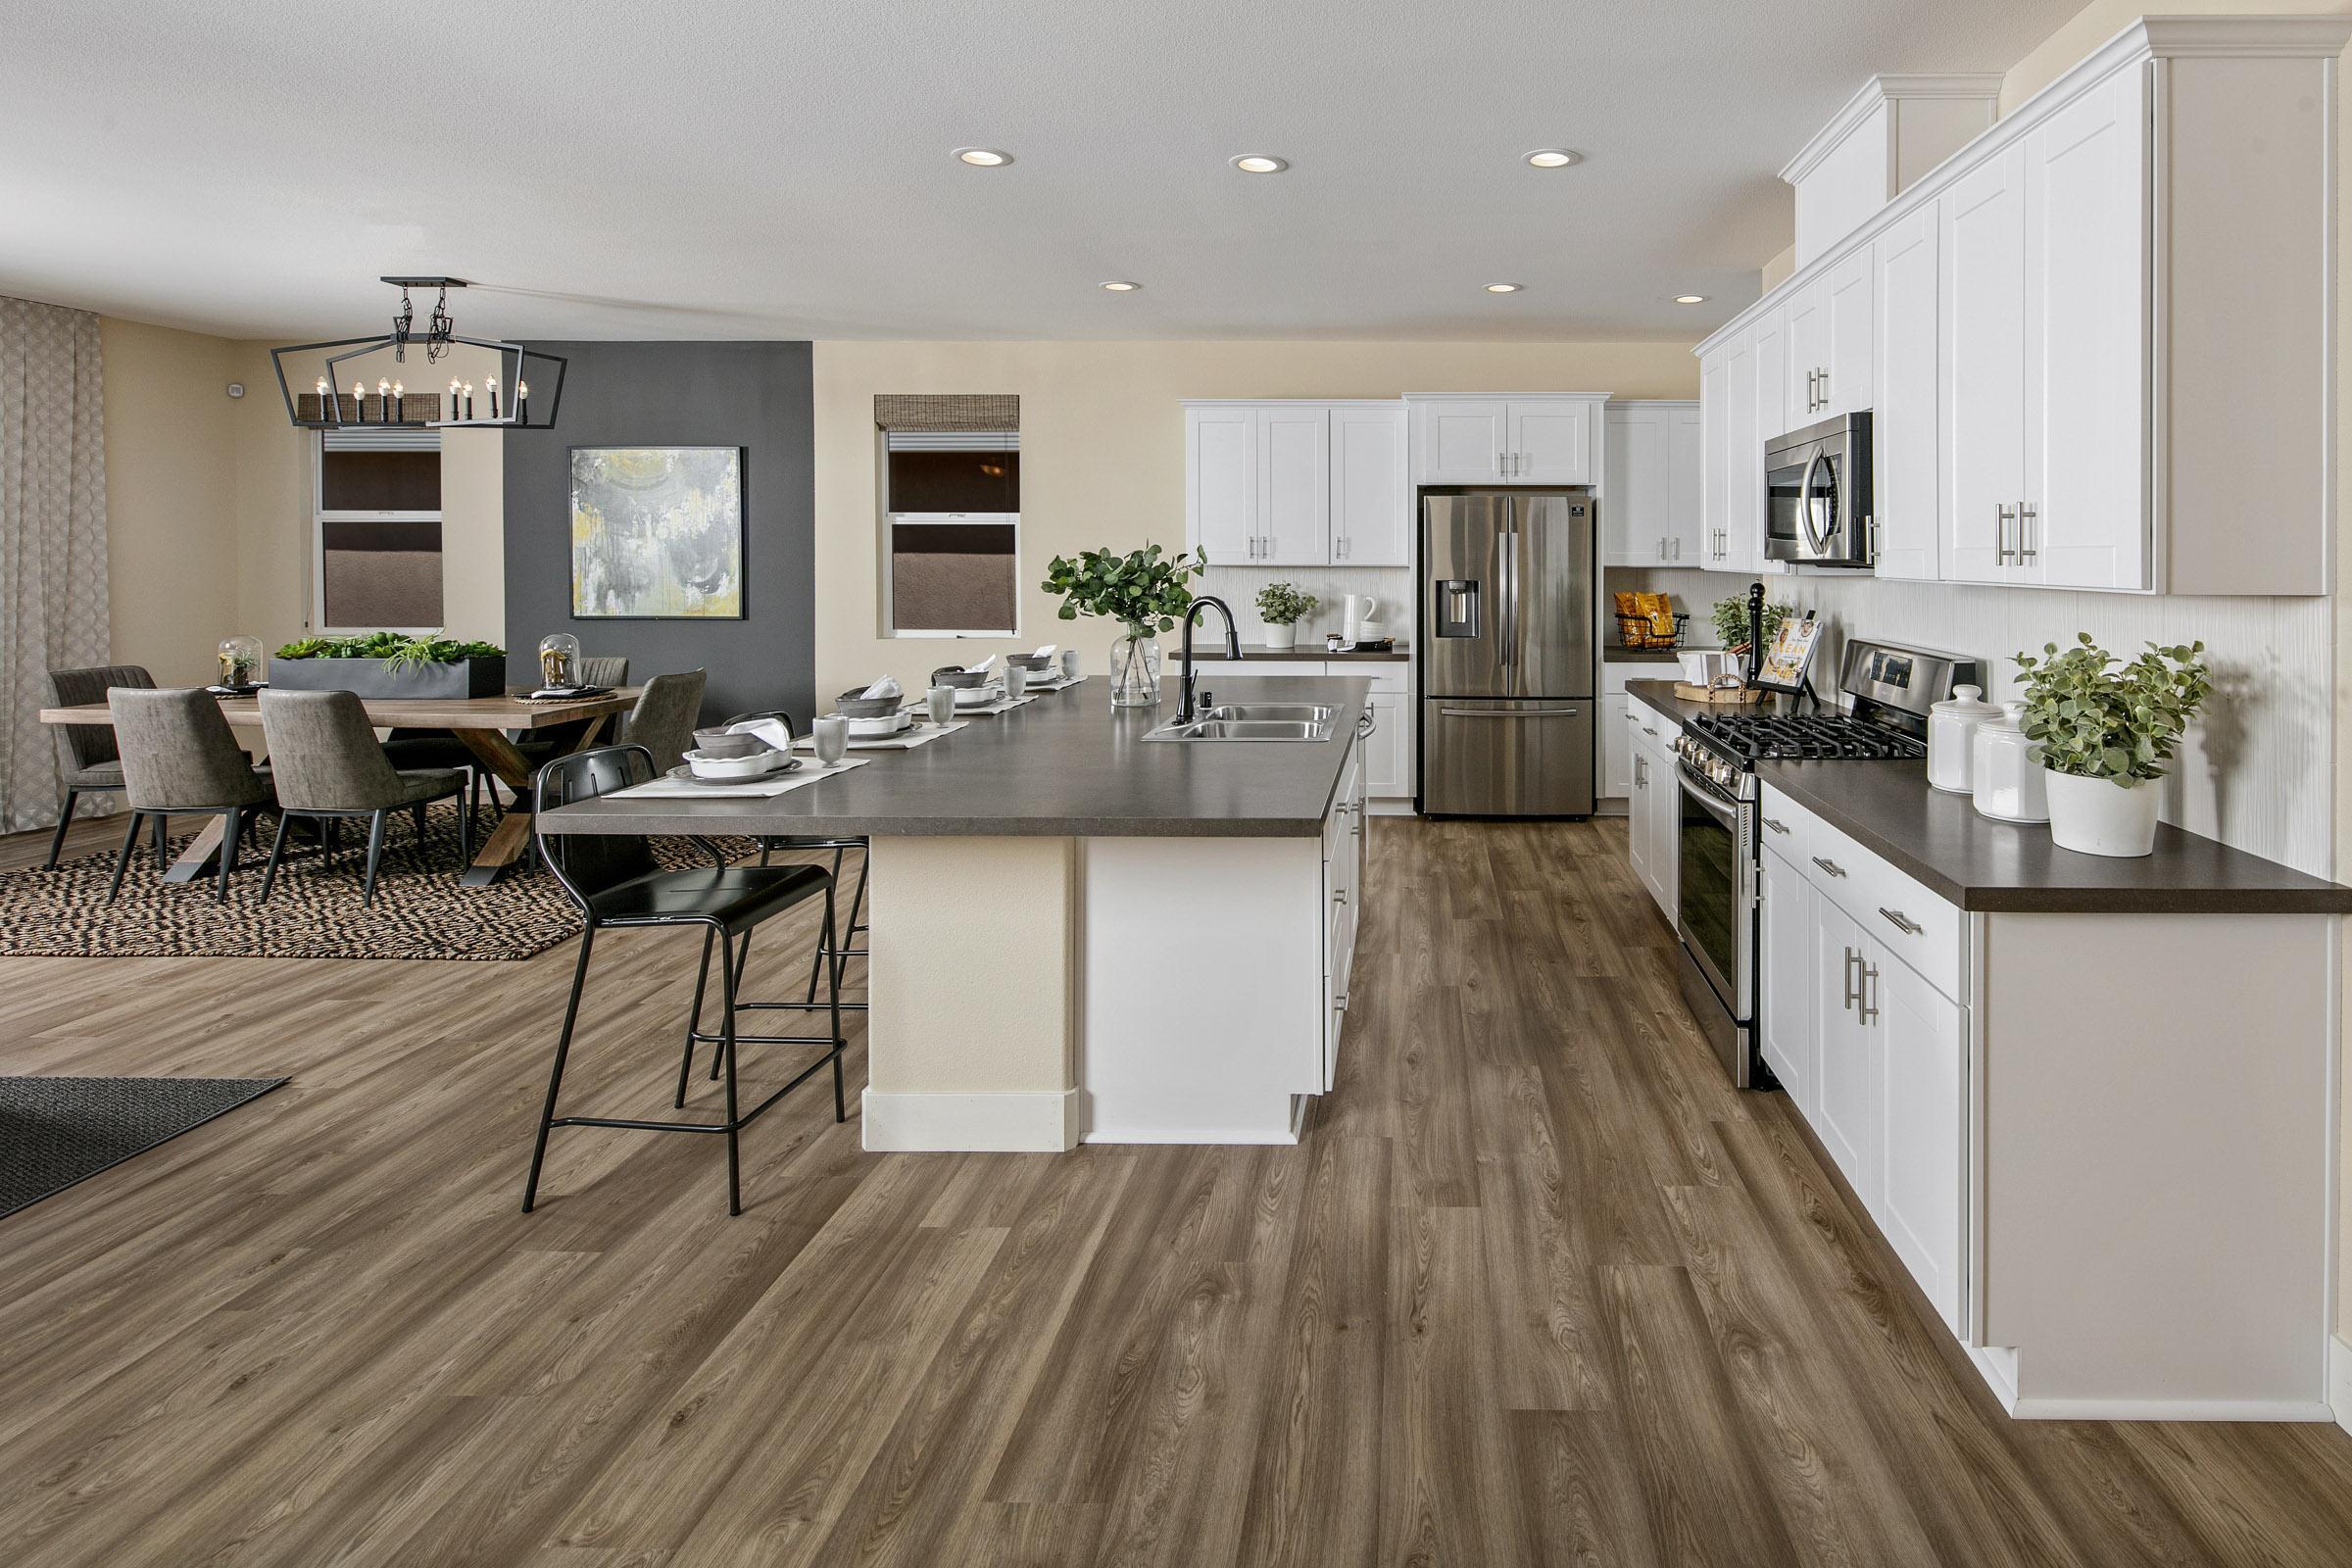 Kitchen featured in the Plan 2 By Watt Communities in Sacramento, CA